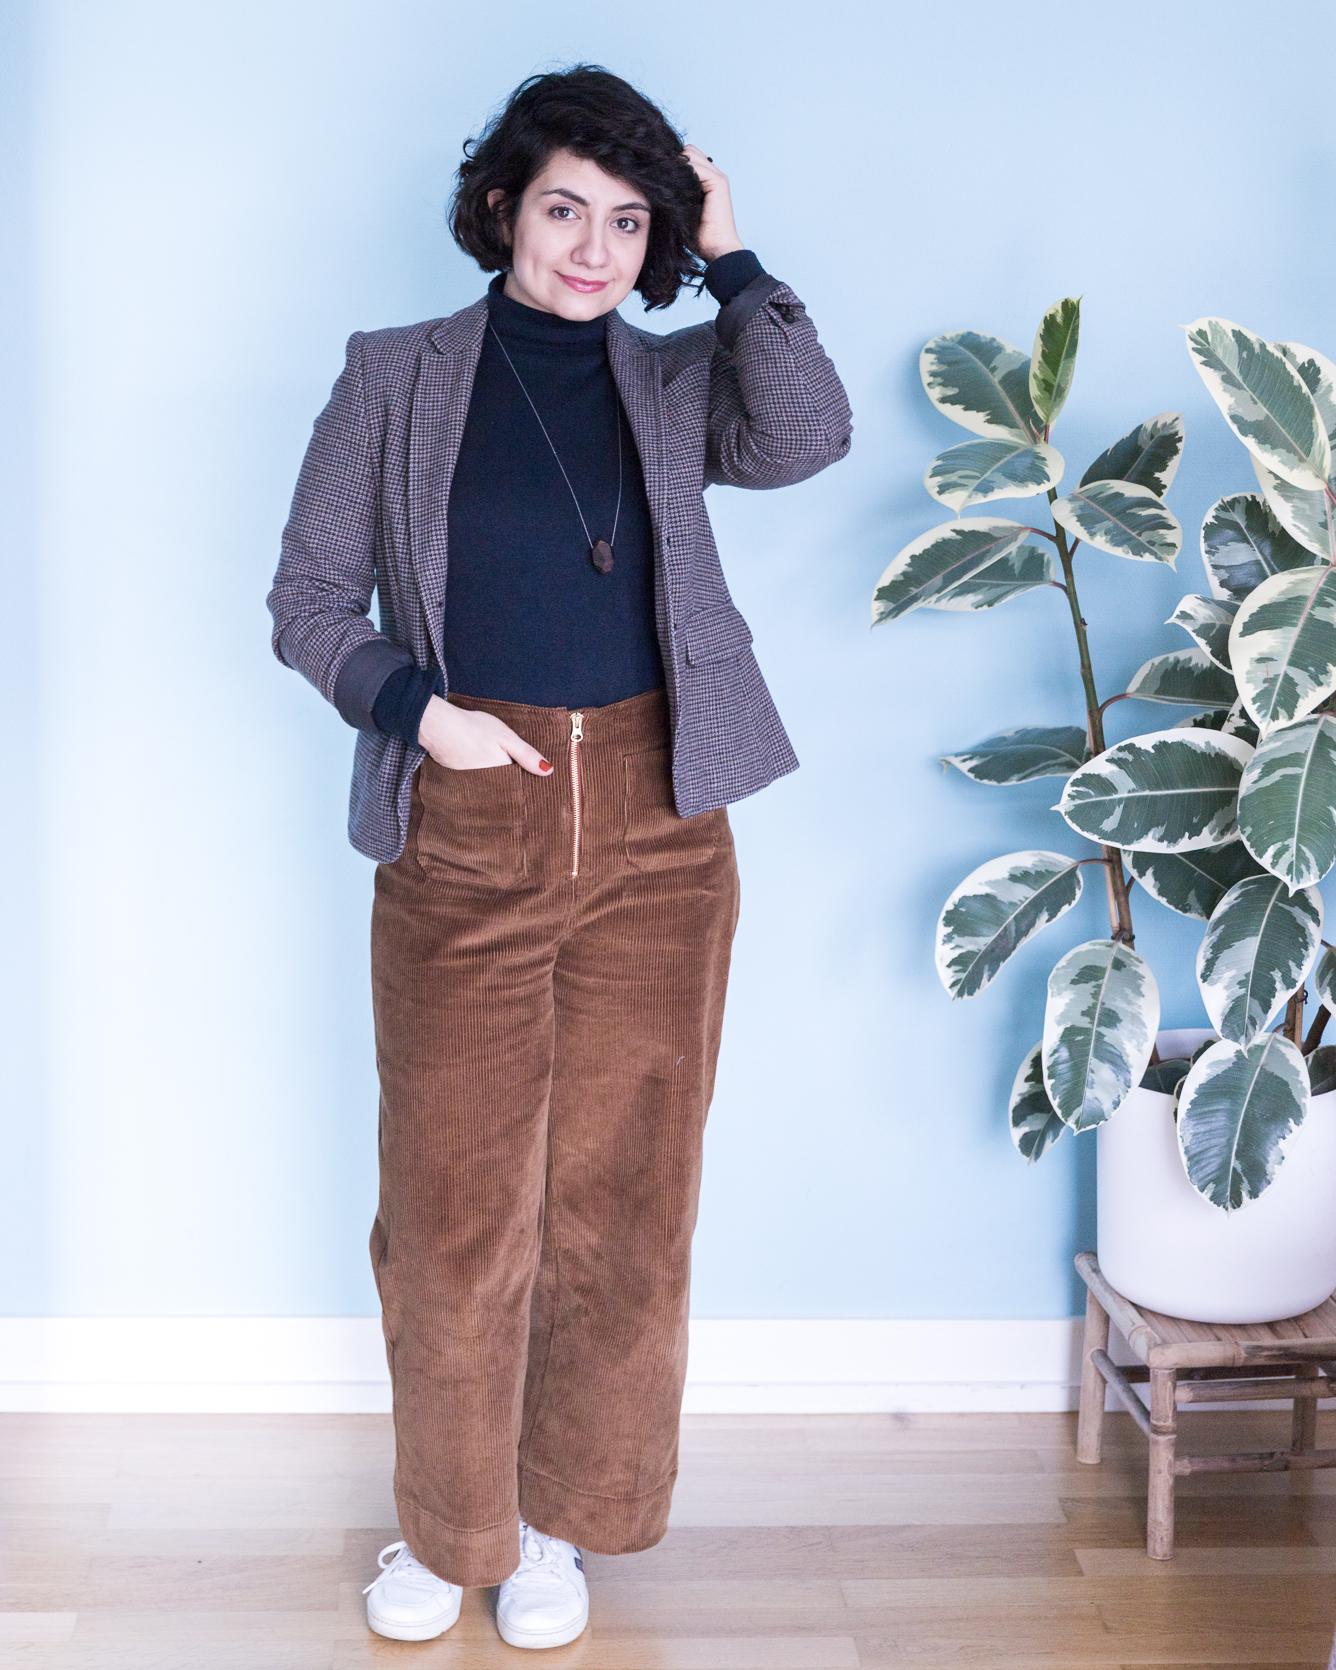 Outfit Schnittmuster Rollkragenpullover Modular und Schnittmuster High Waist Hose Lola aus Cord